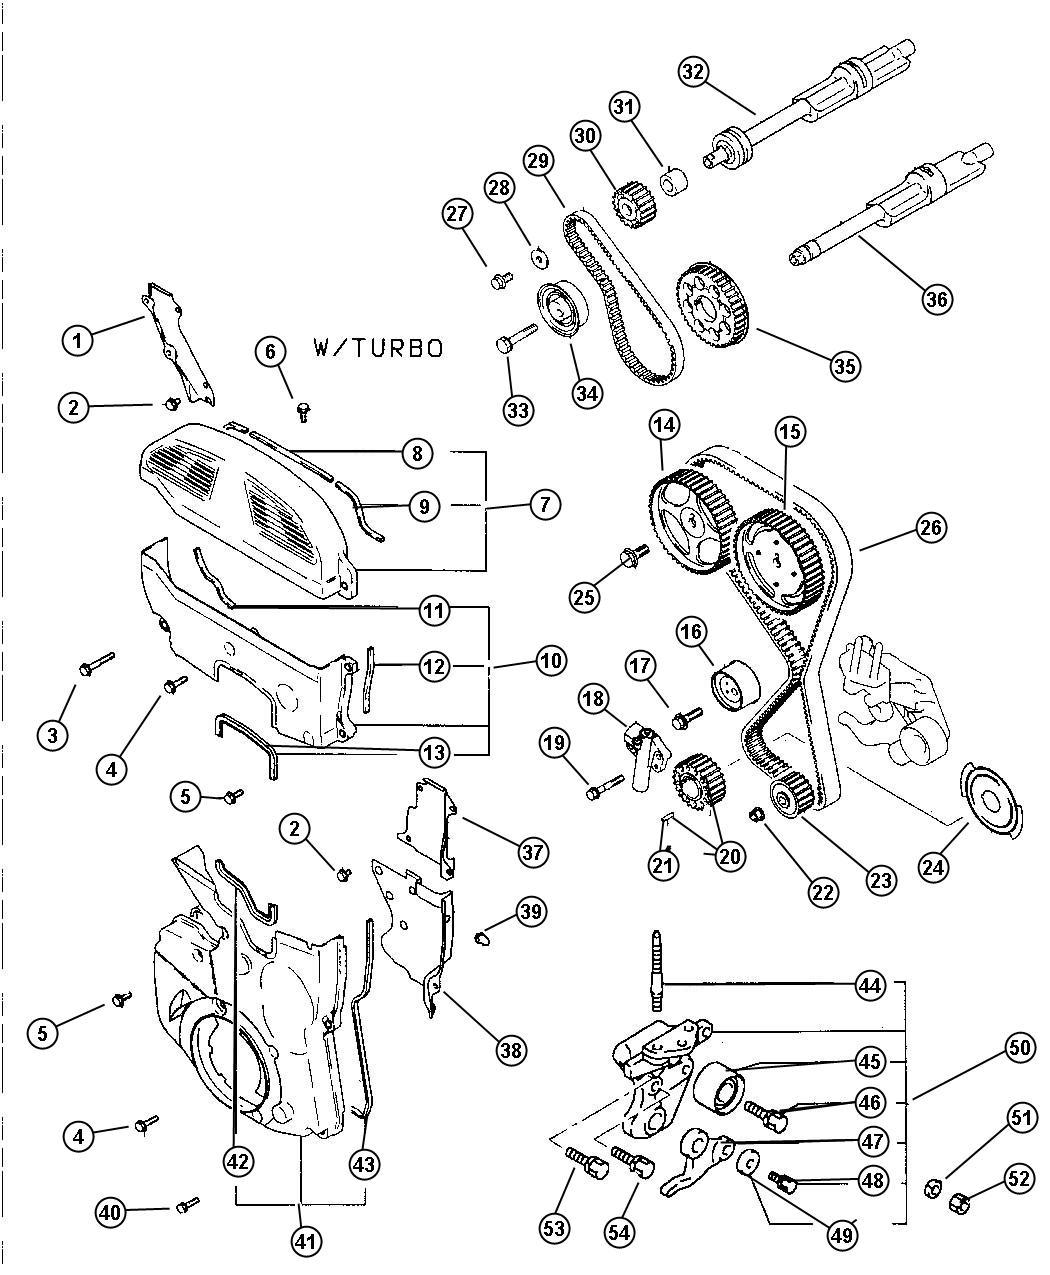 Subaru Svx Fuse Box Ford E250 Fuse Box Wiring